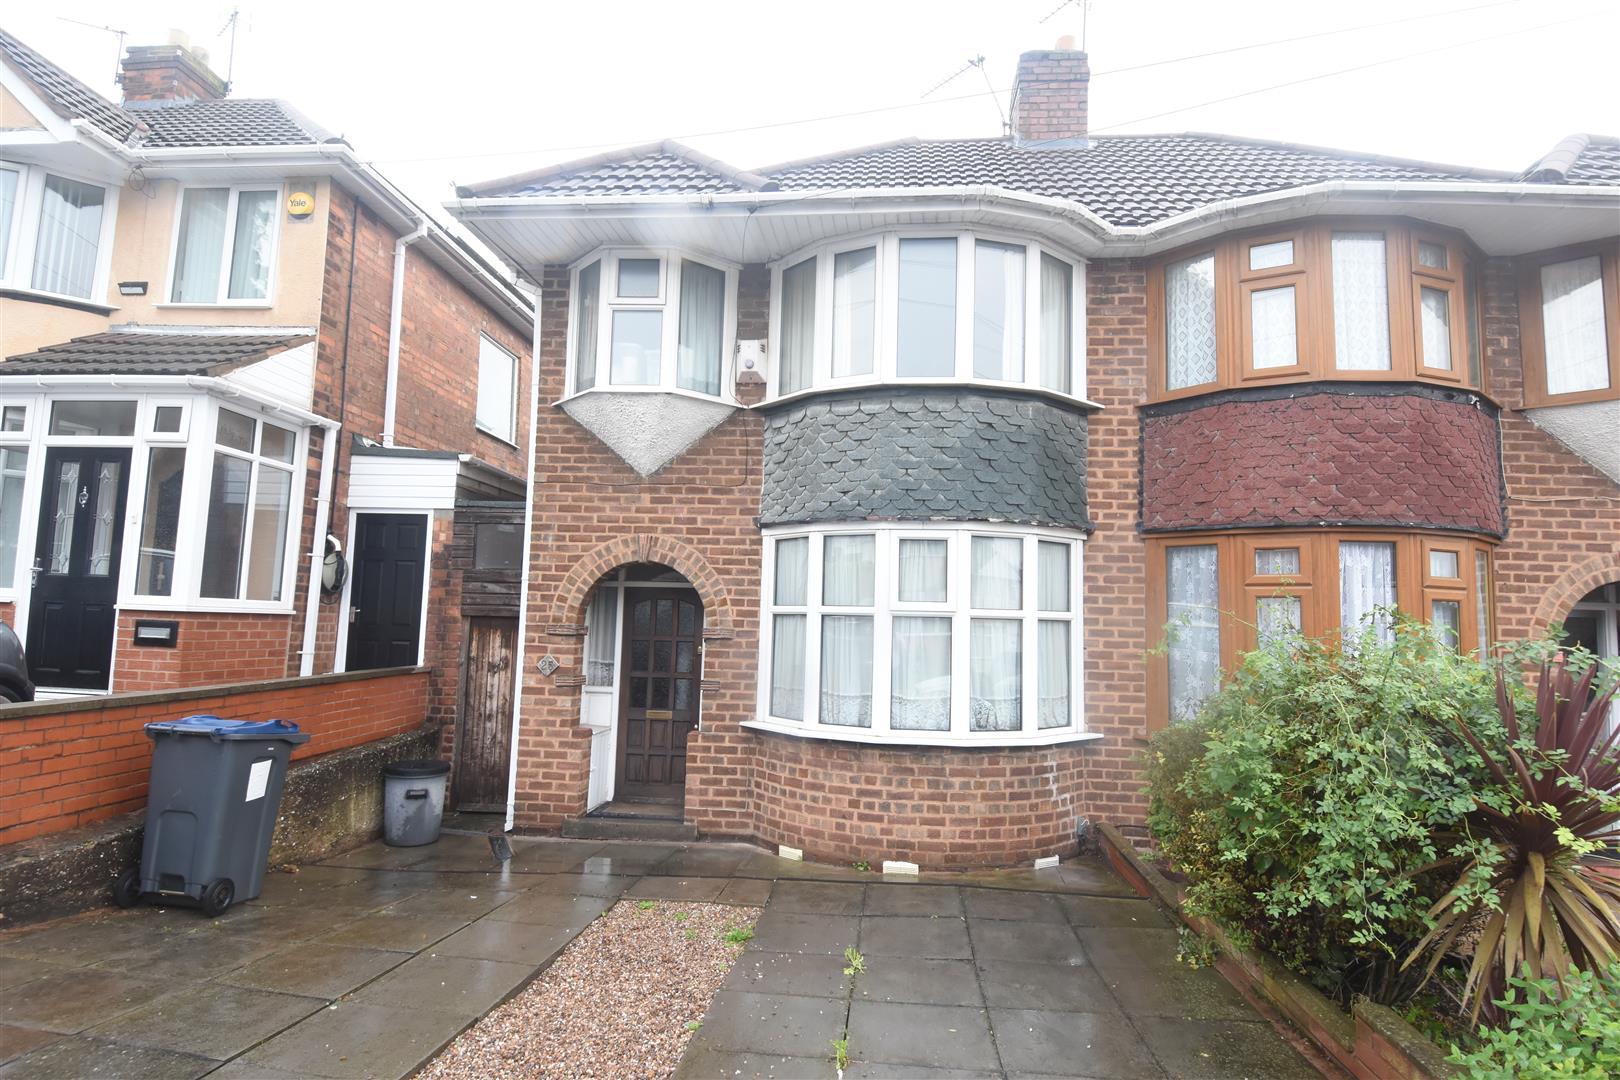 3 bed house for sale in Haycroft Avenue, Birmingham, B8